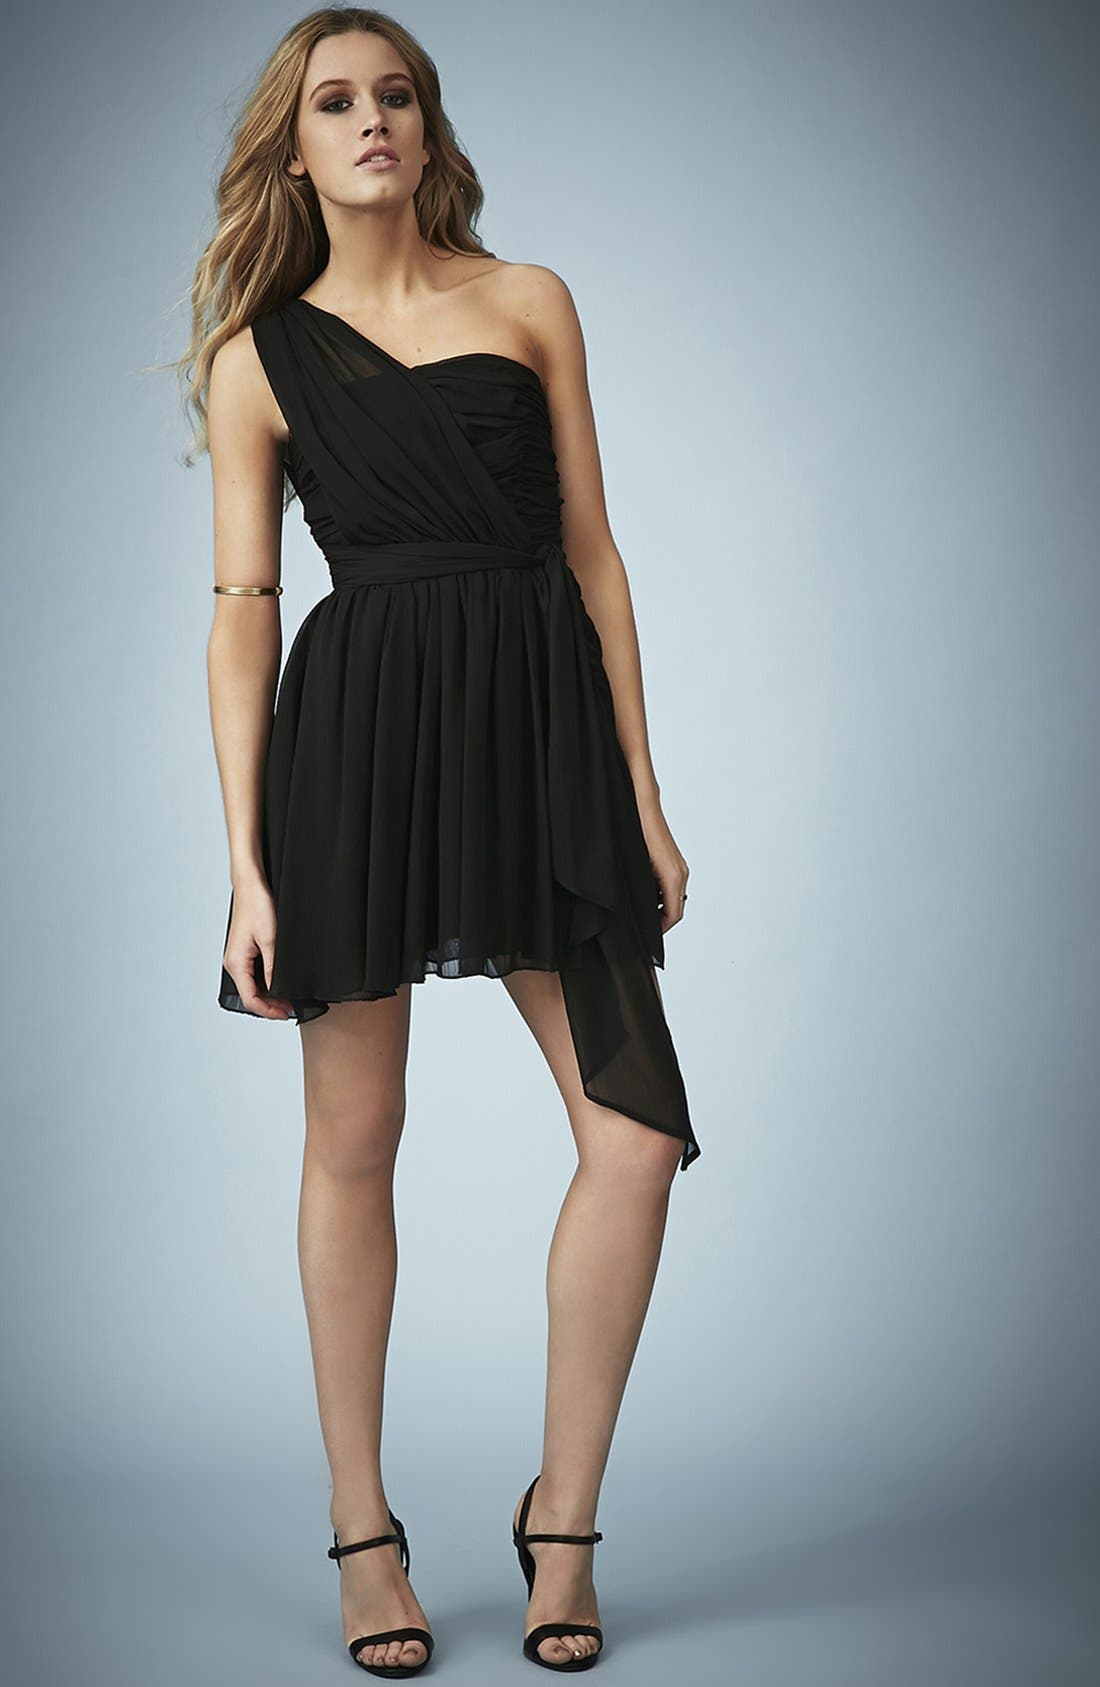 TOPSHOP, Kate Moss for Topshop One-Shoulder Chiffon Dress, Alternate thumbnail 4, color, 001